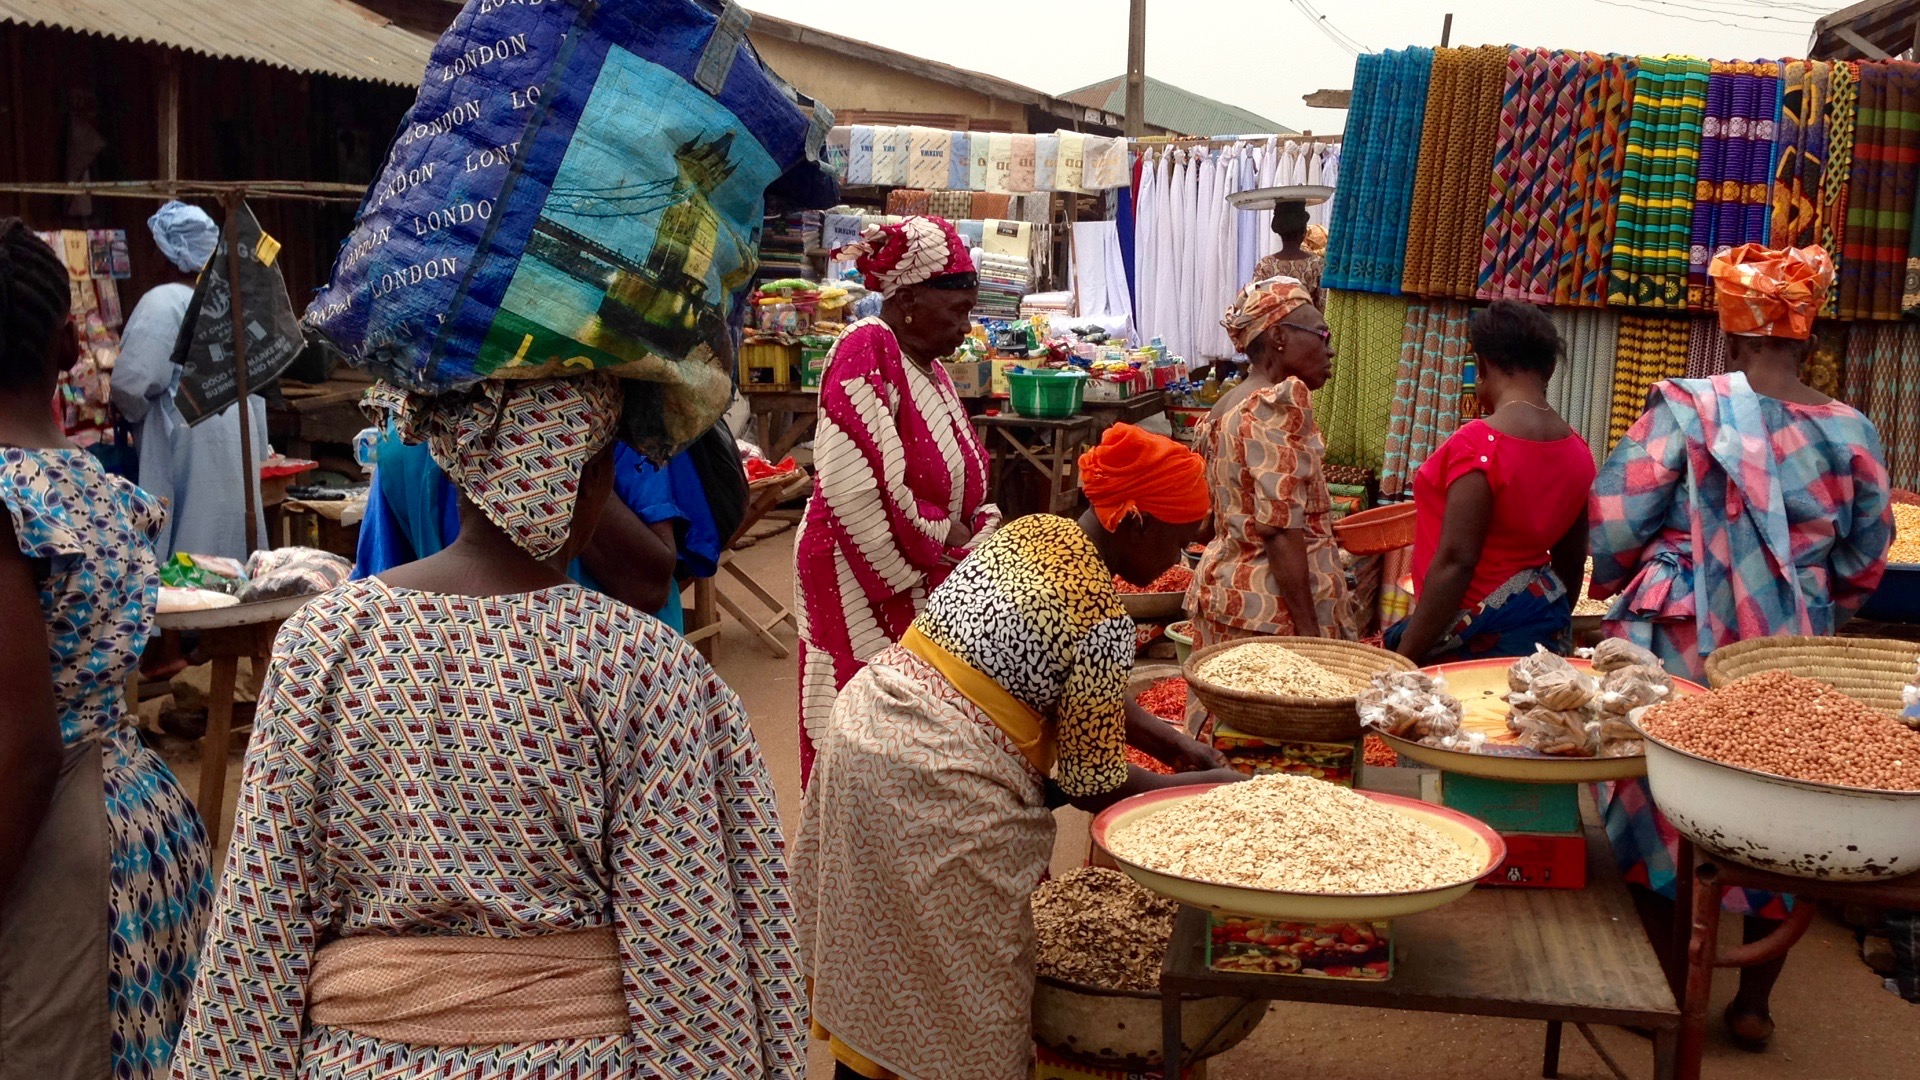 Food prices, Nigeria's household expenditure